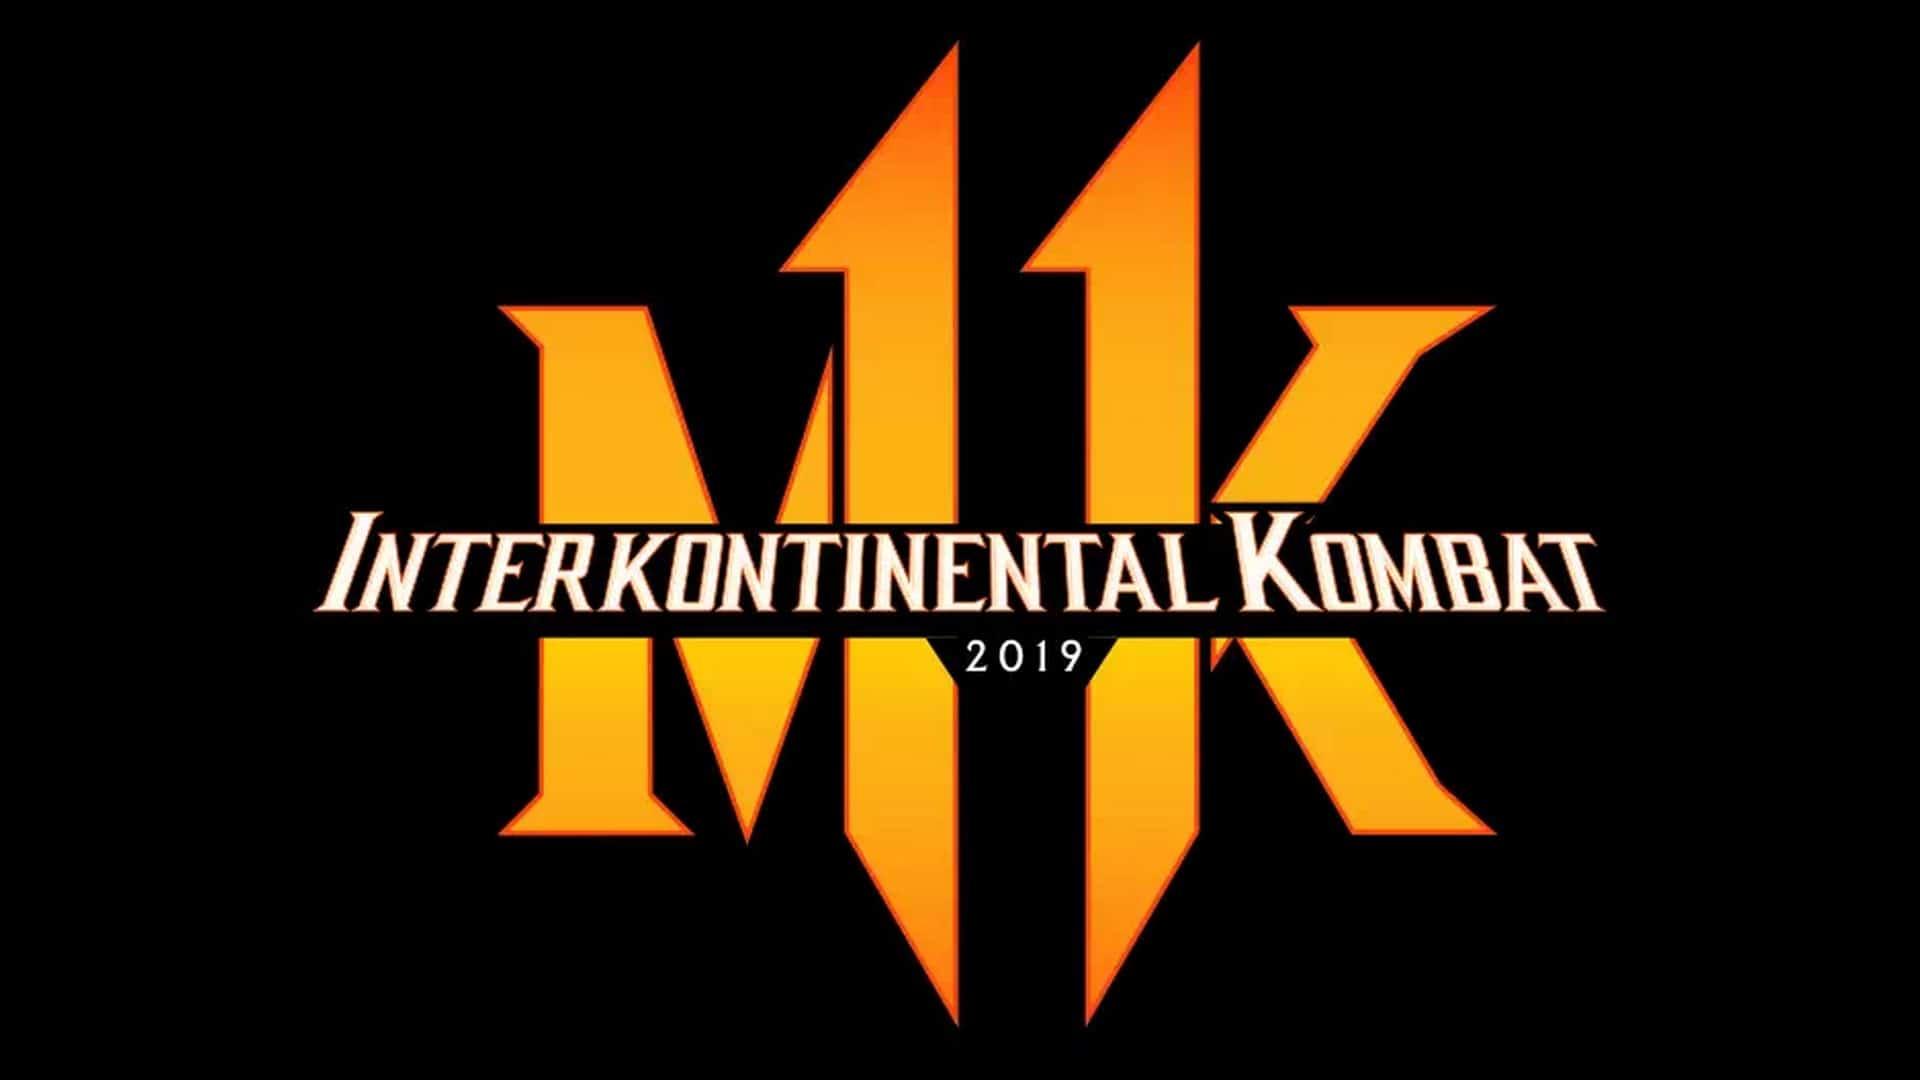 Interkontinental Kombat Series Kicks Off June 2019 As Part Of The Mortal Kombat 11 Pro Kompetition